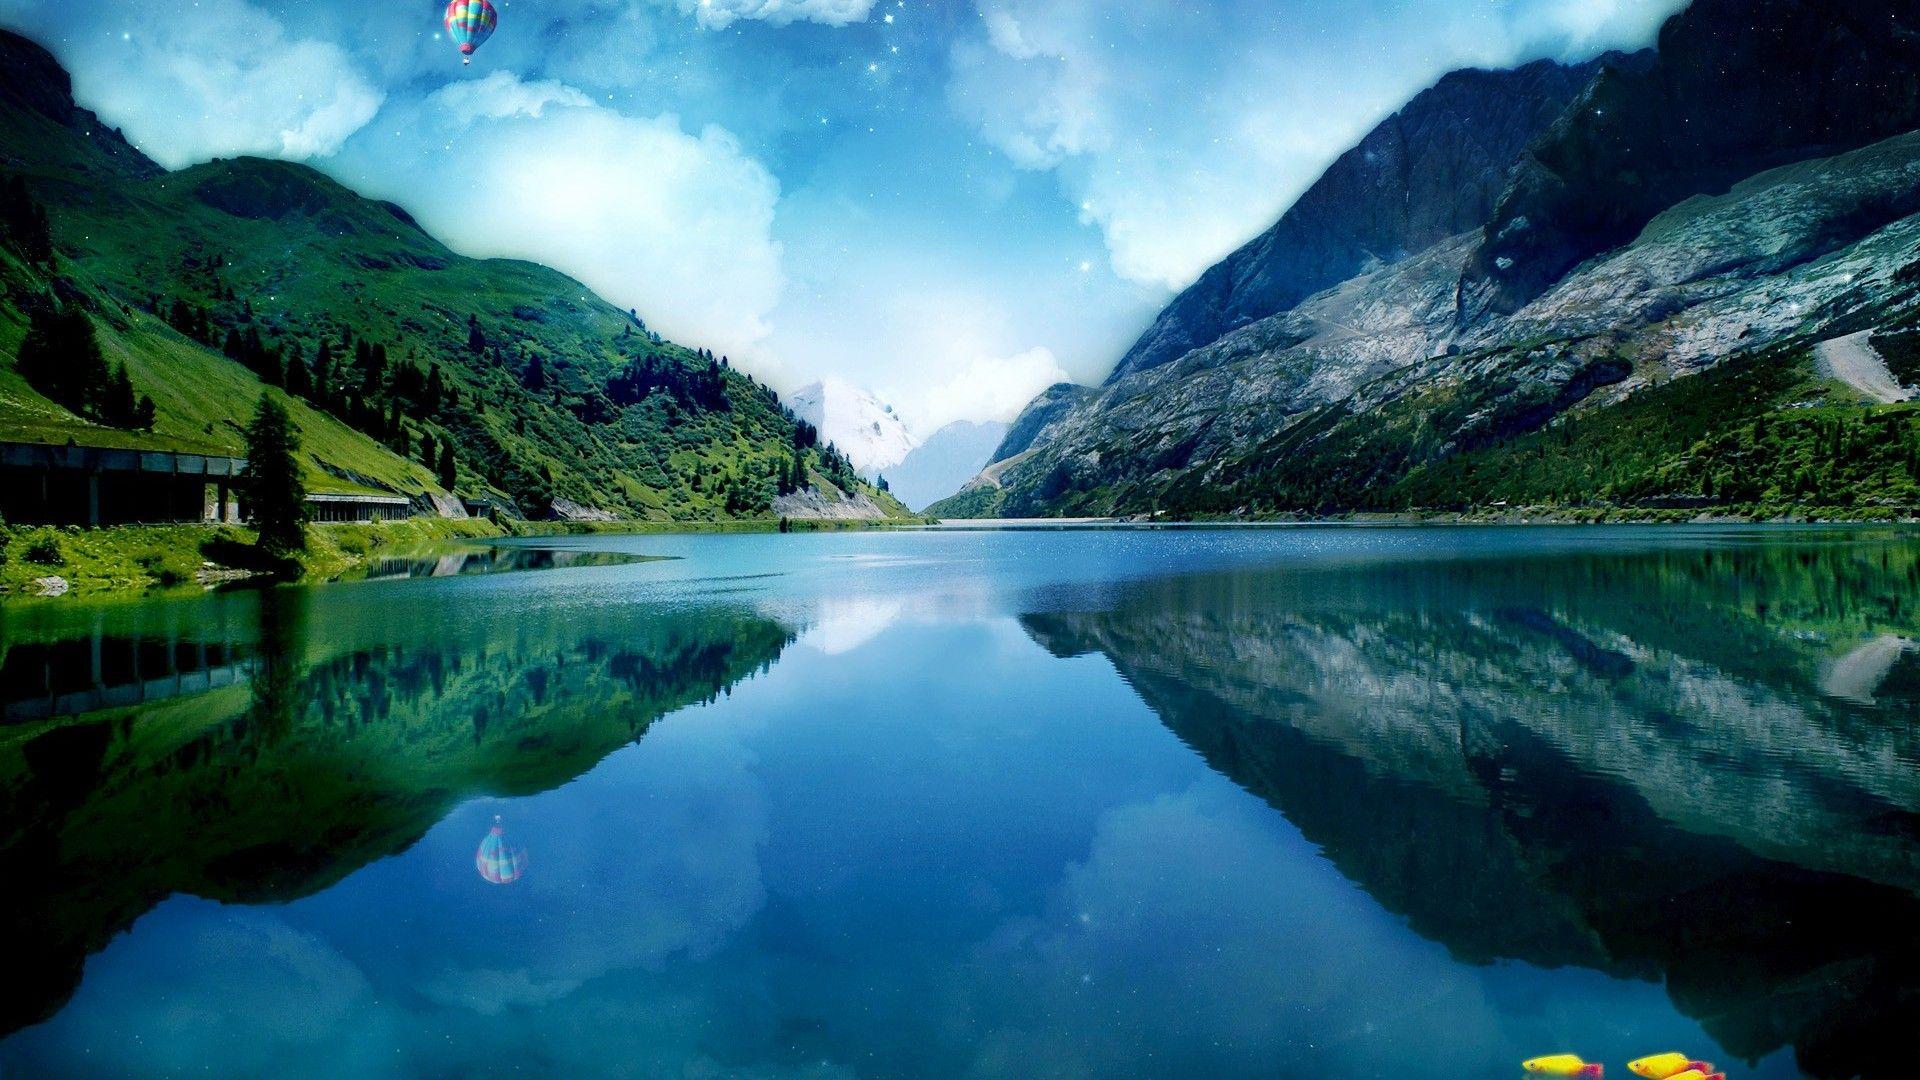 full hd 1080p nature wallpapers, desktop backgrounds hd downloads